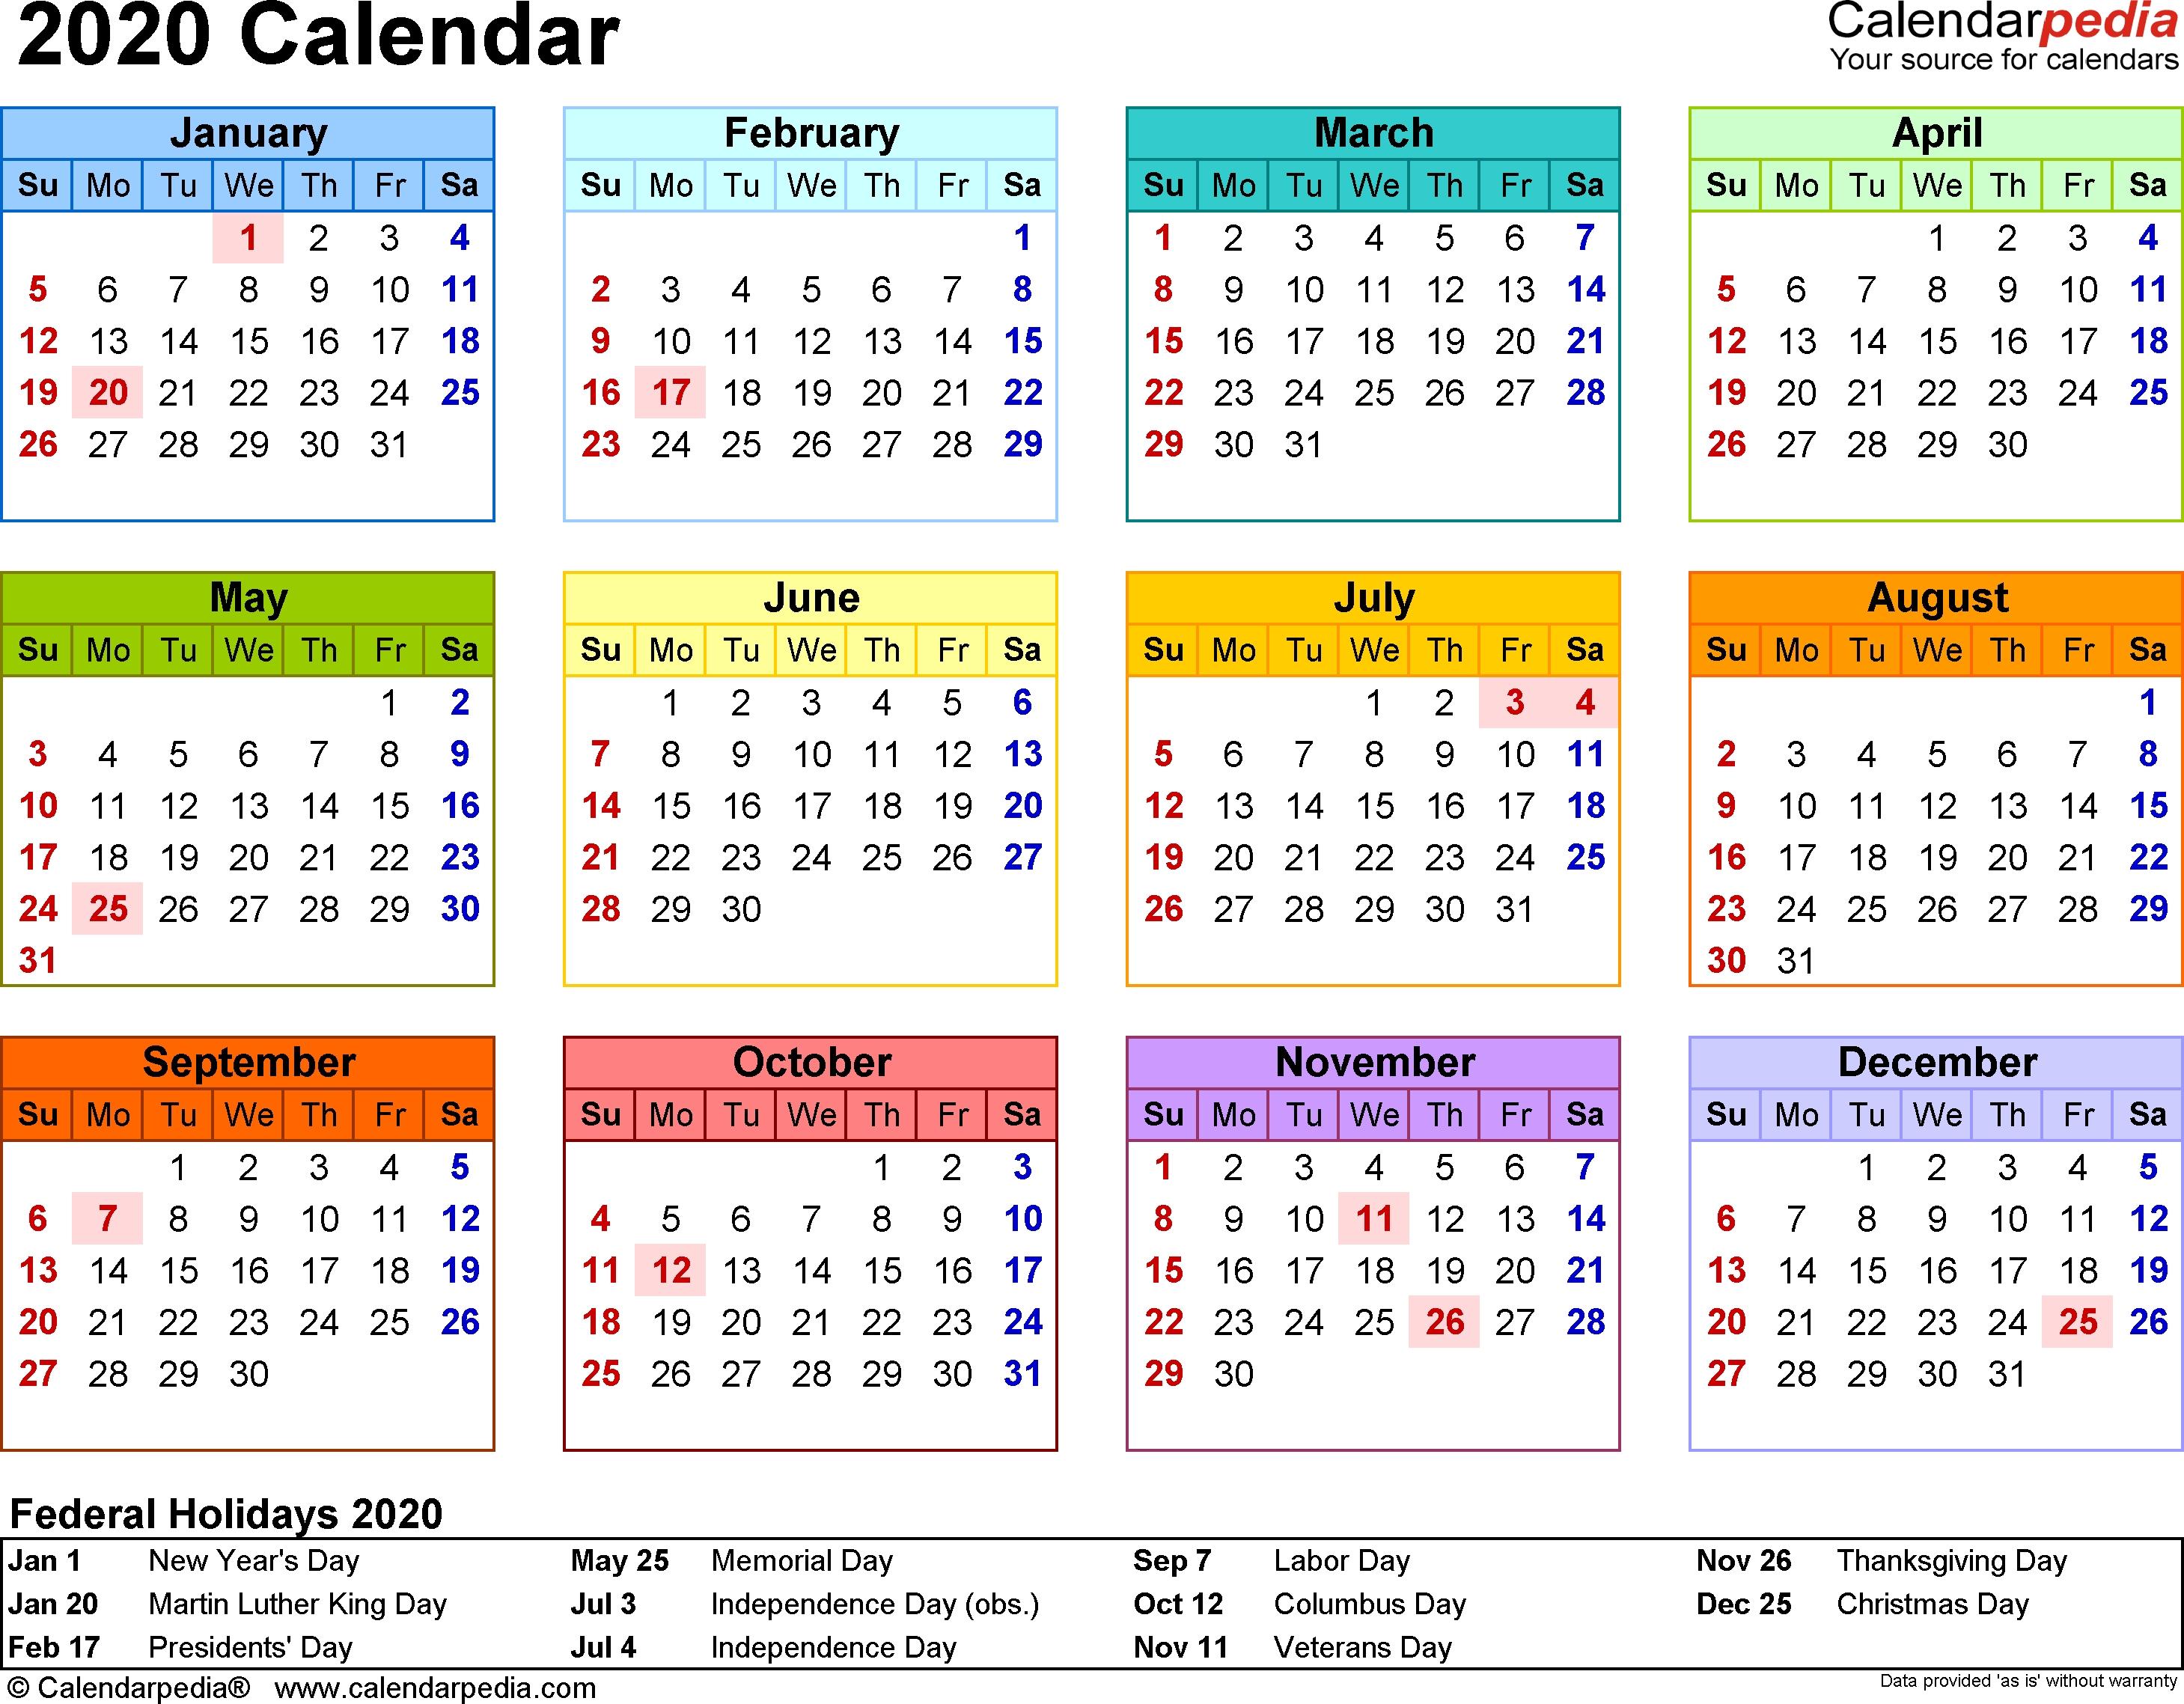 2020 Calendar Pdf - 17 Free Printable Calendar Templates  Year At A Glance Calendars Printable